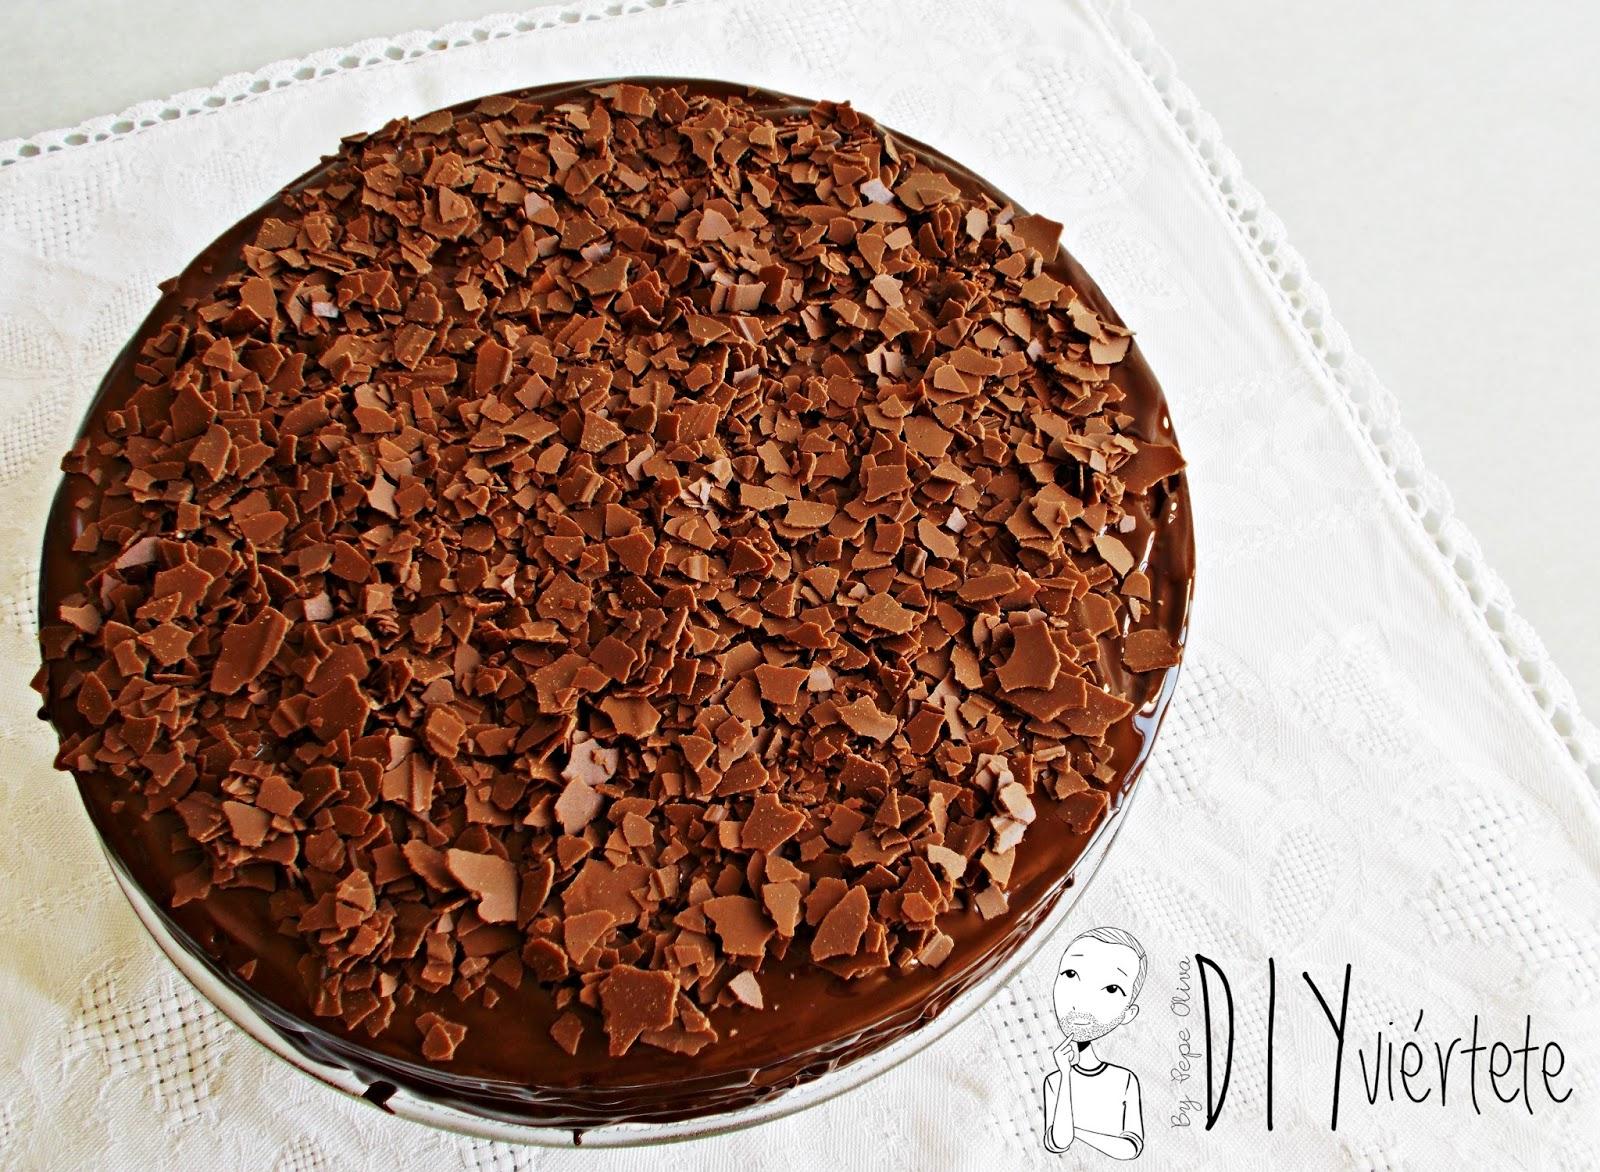 cocina-postre-dulce-pastel-tarta-huesitos-chocolate-obleas-nutella-9